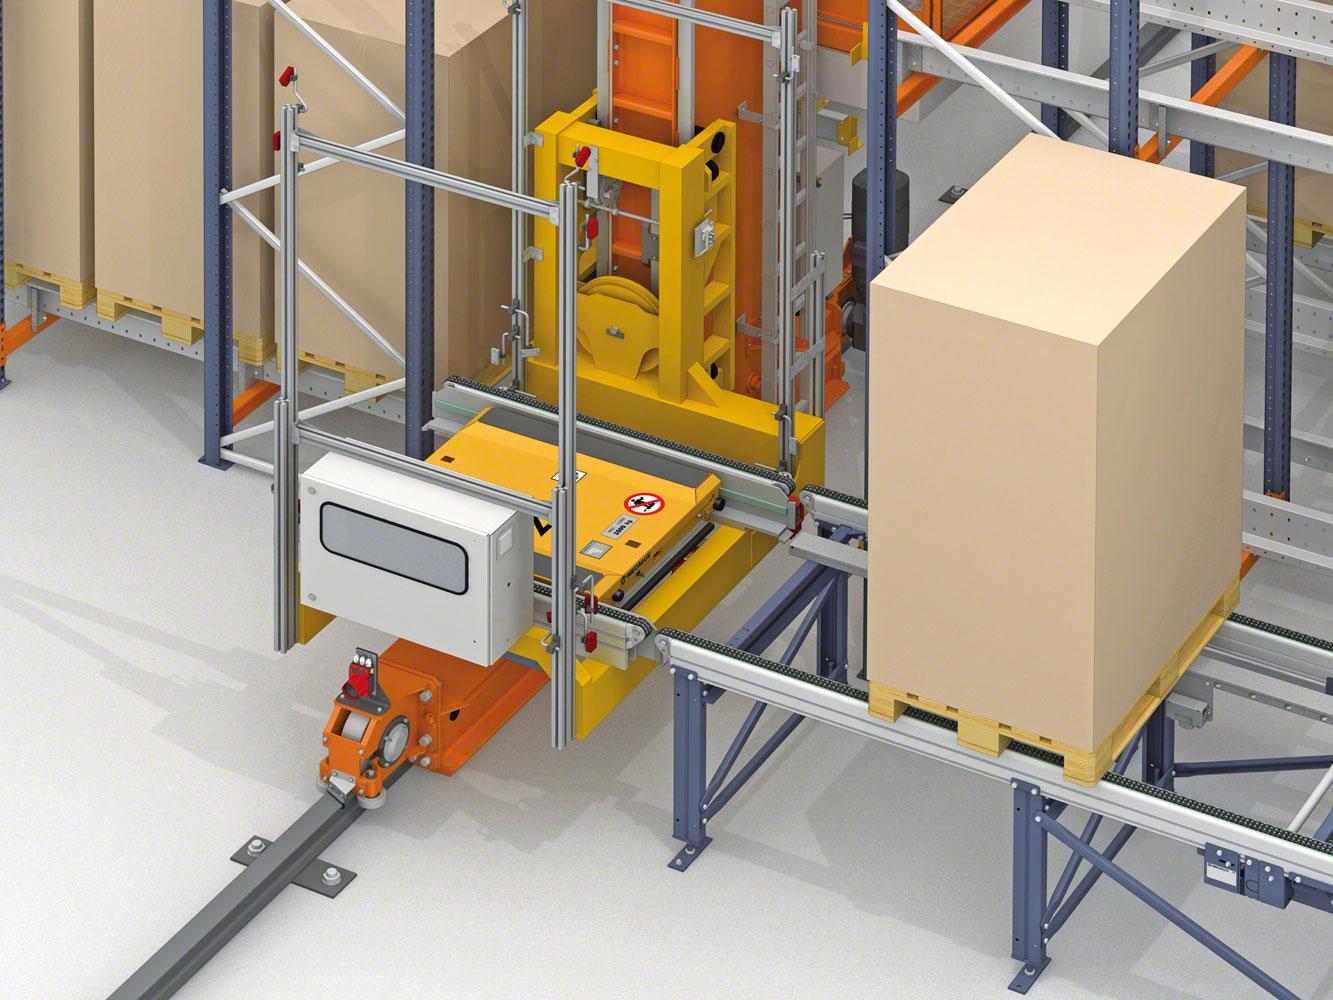 Mecalux equipará dos almacenes de Lanxess en Alemania